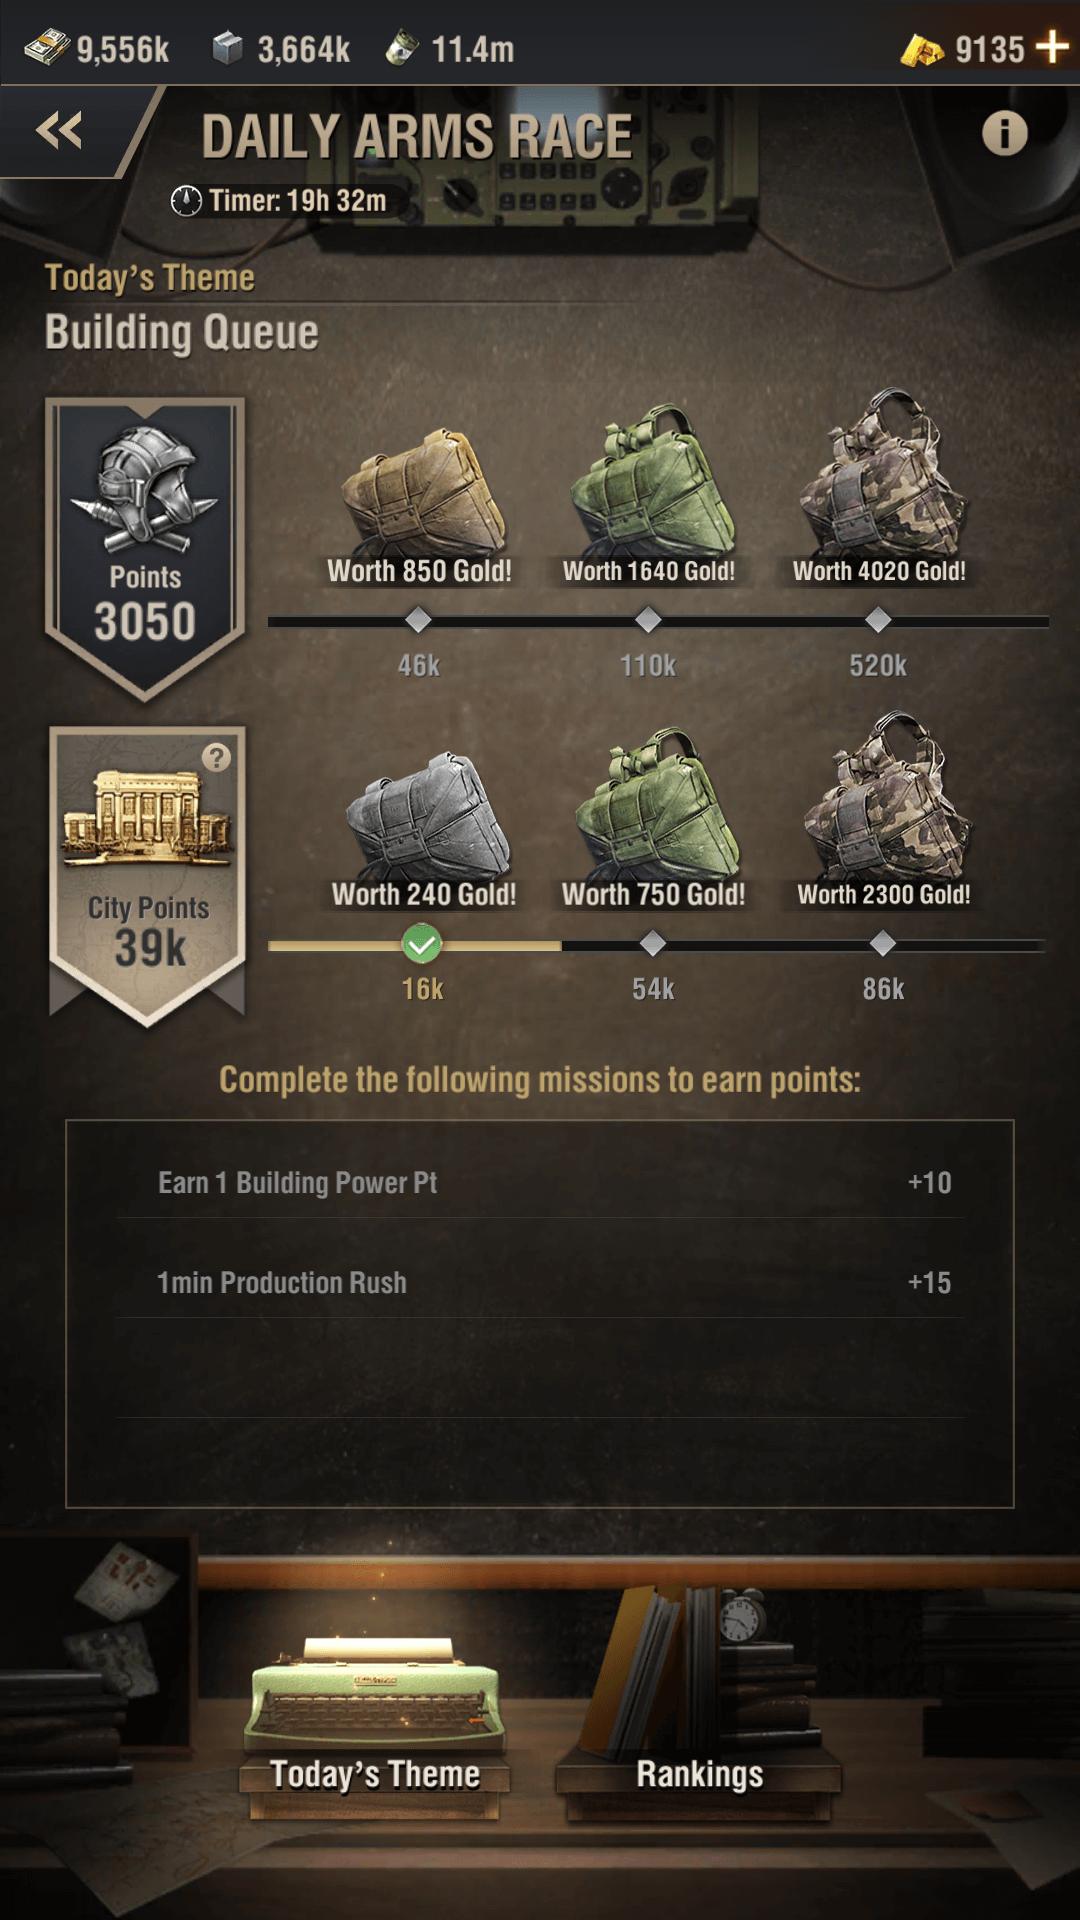 warpath arms race event screenshot 1